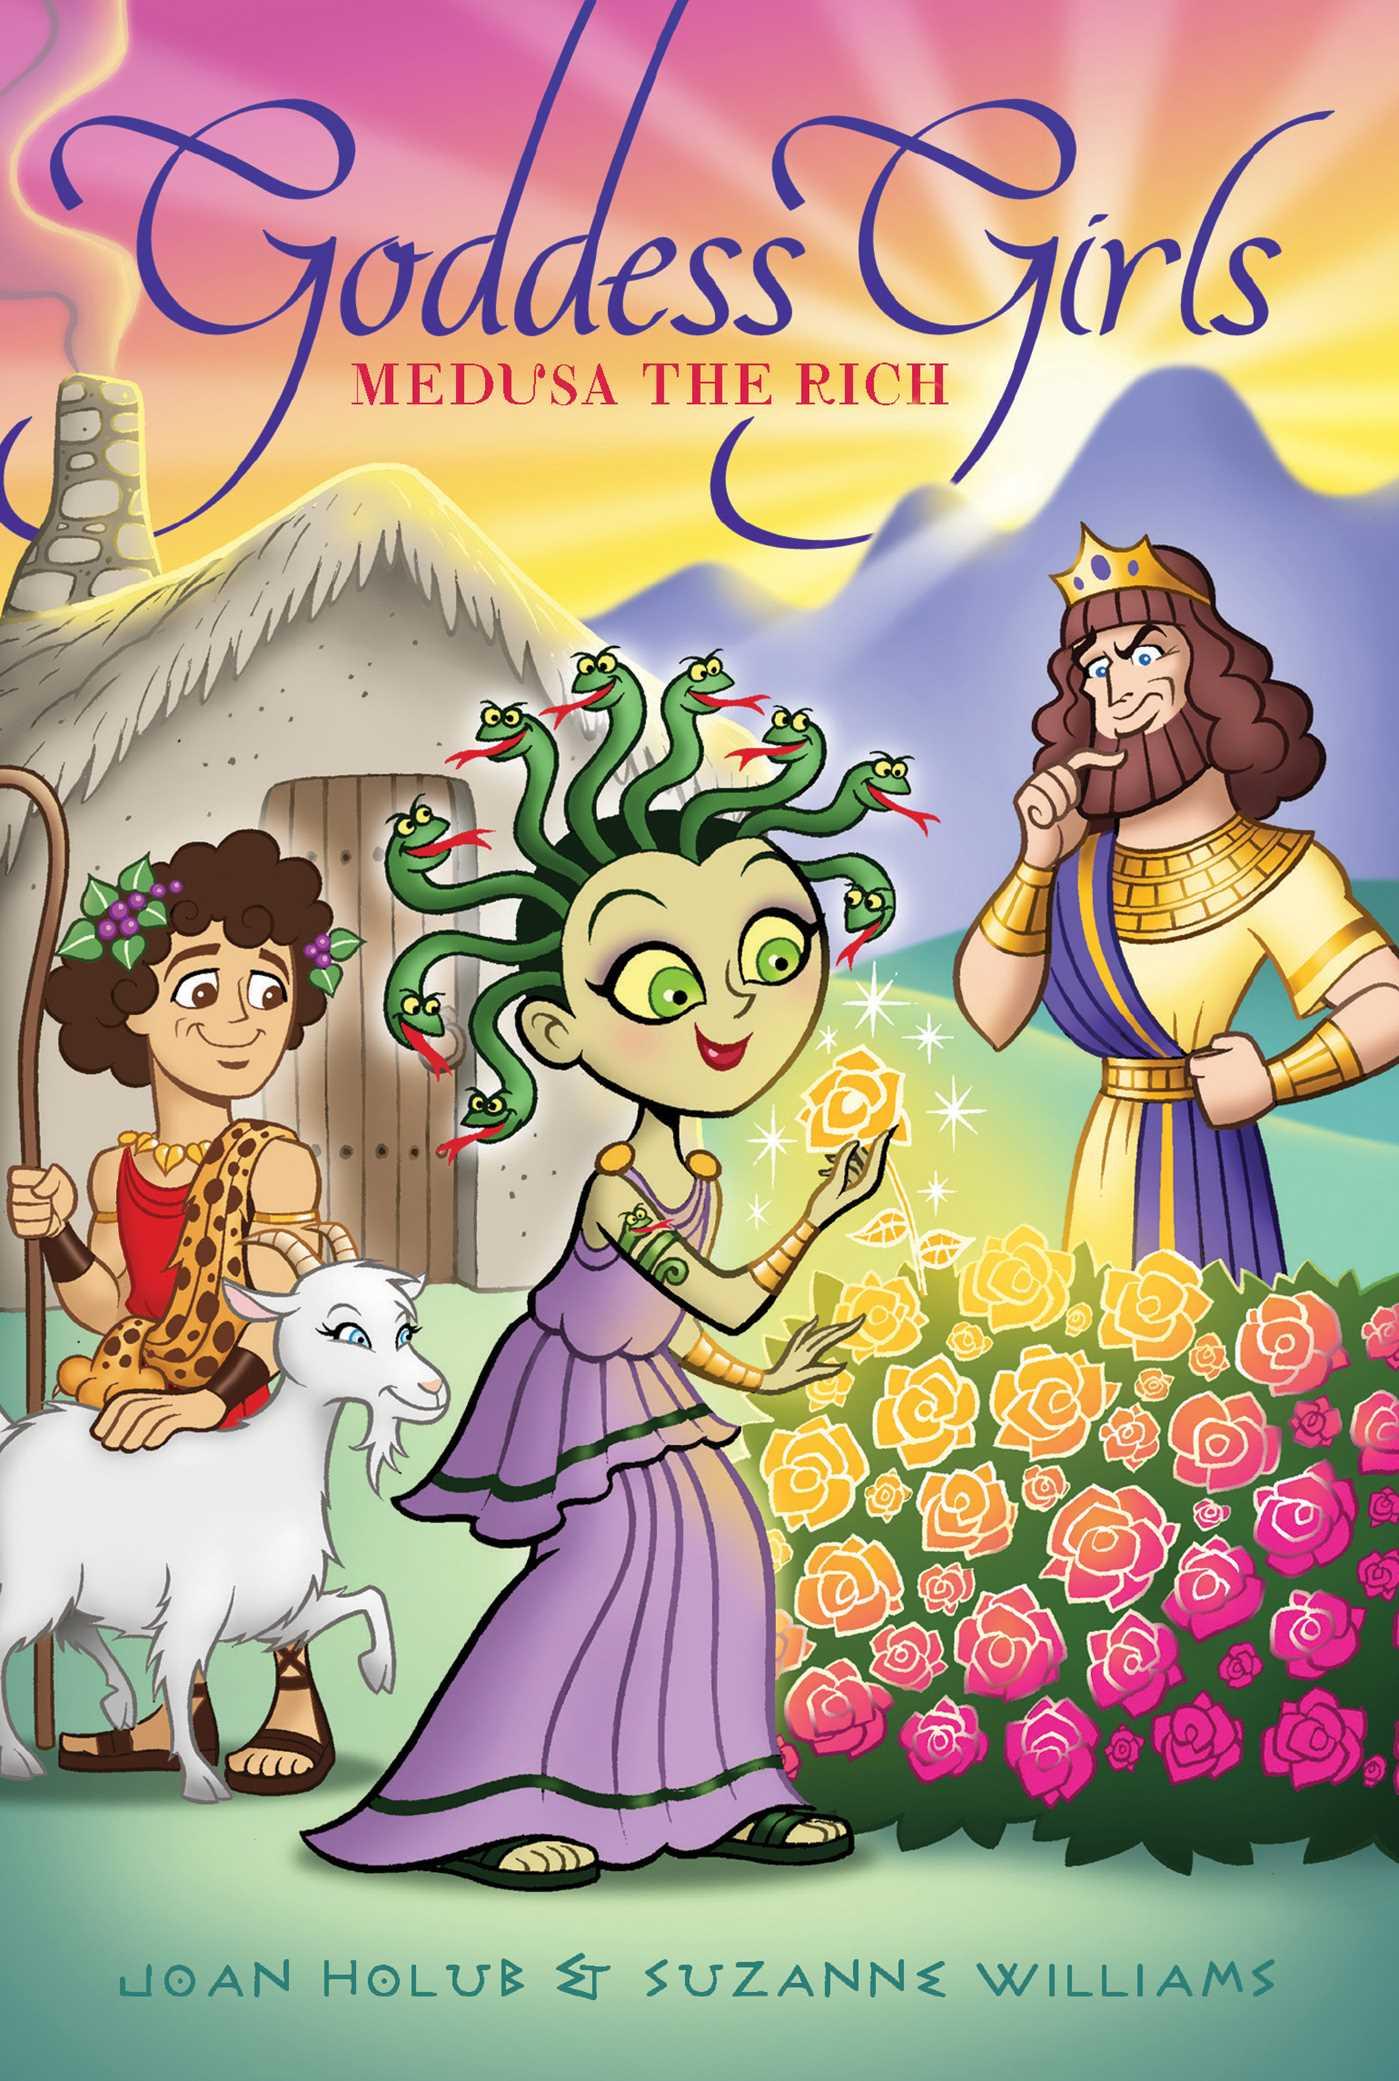 Medusa the rich 9781442488298 hr